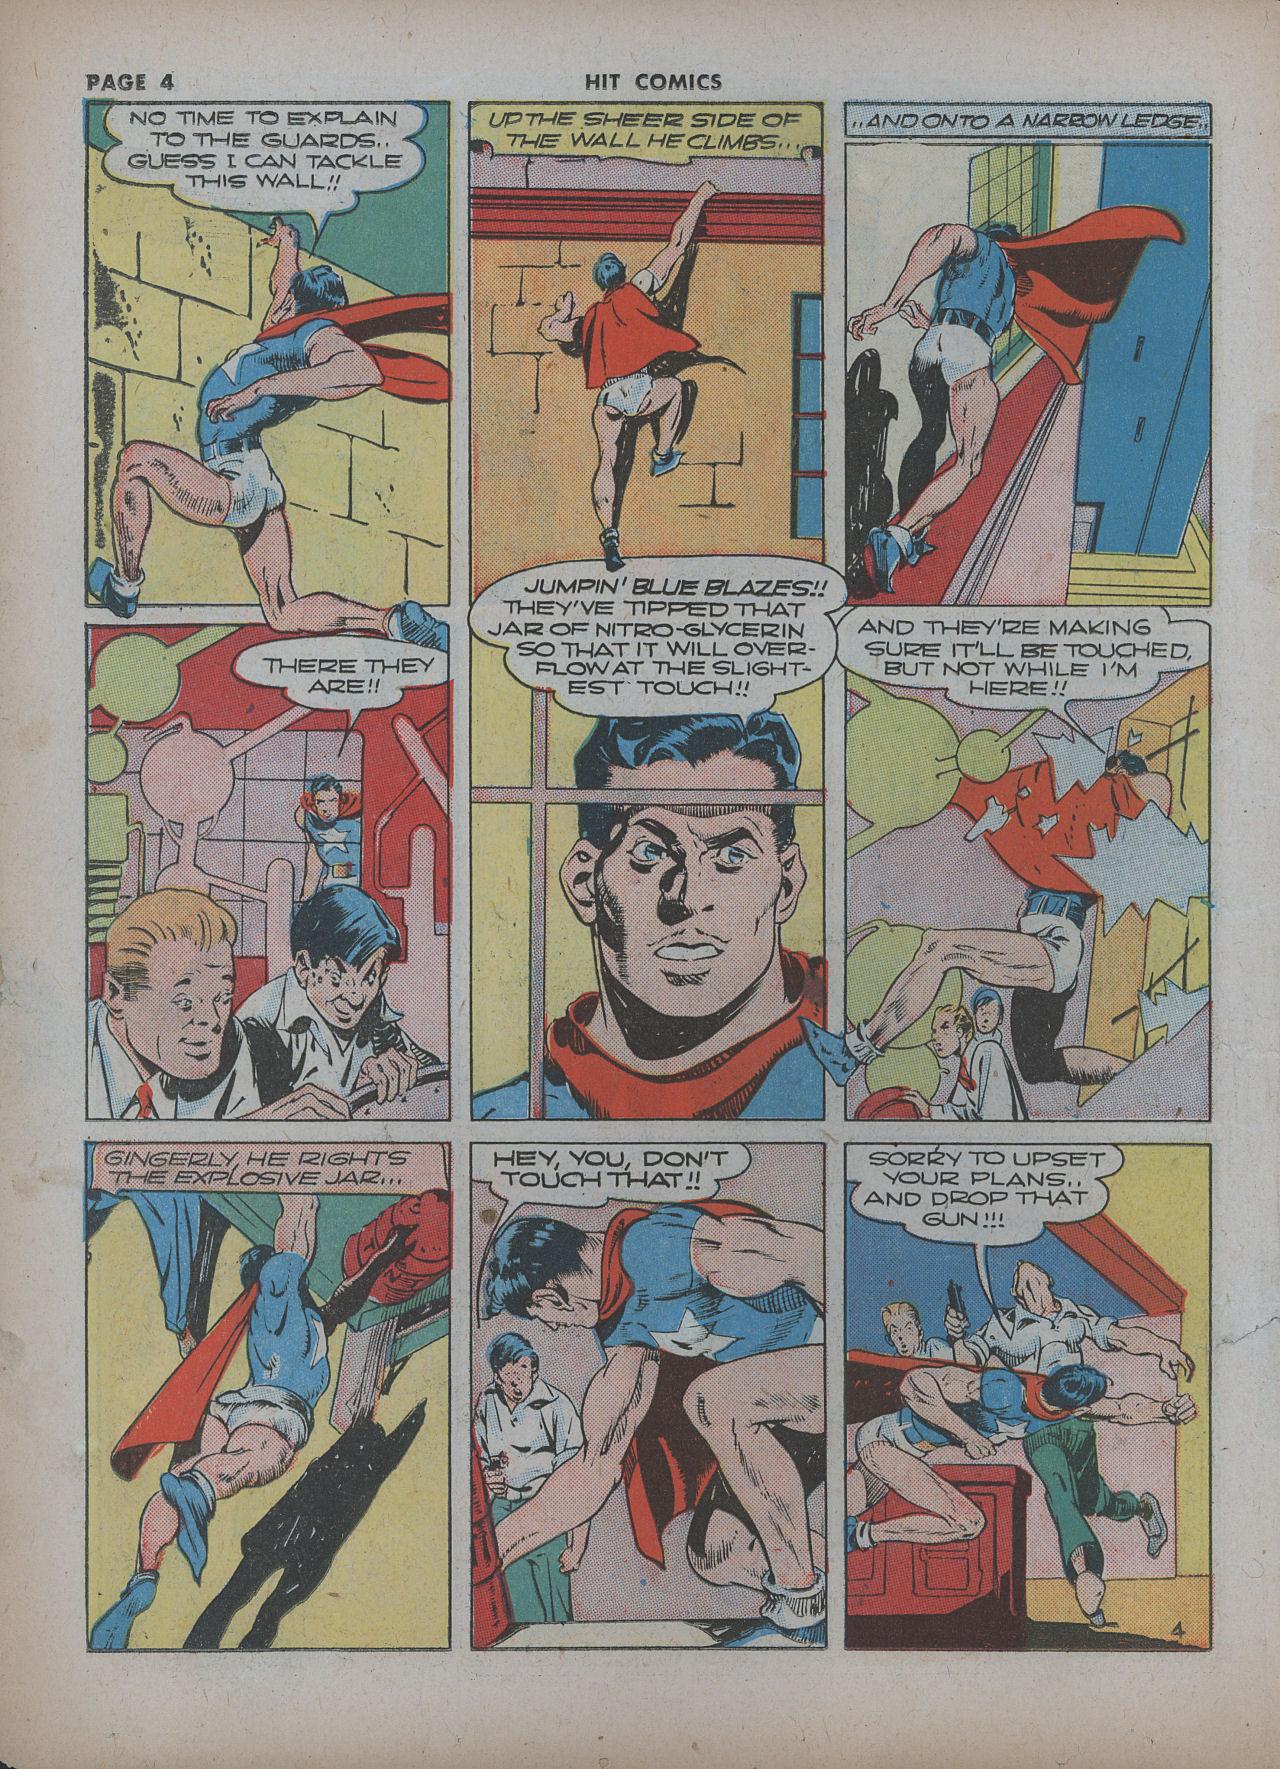 Read online Hit Comics comic -  Issue #22 - 6